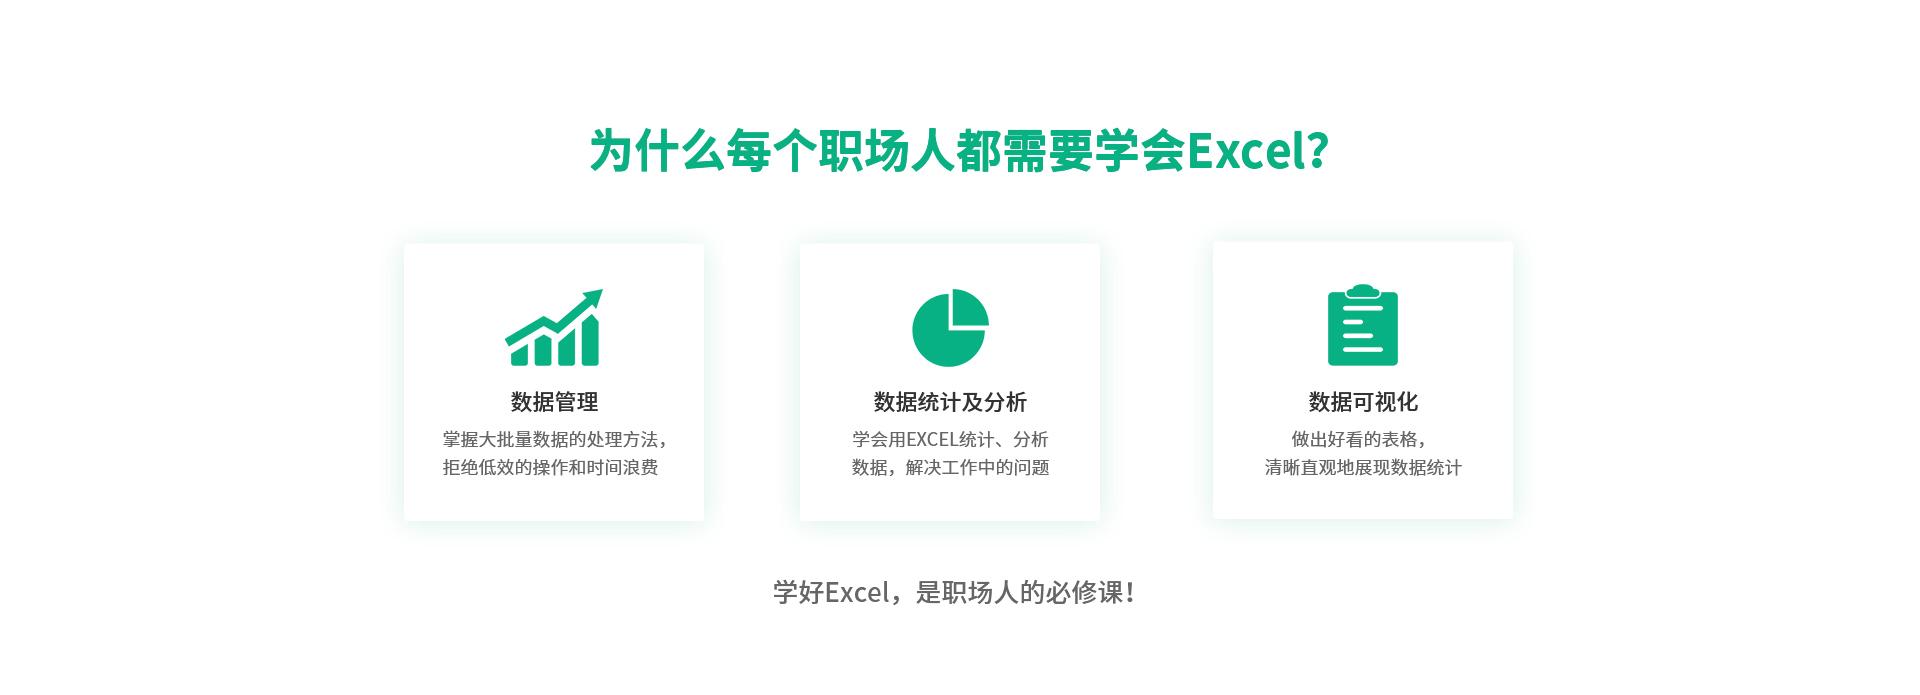 excel-PC_01.jpg